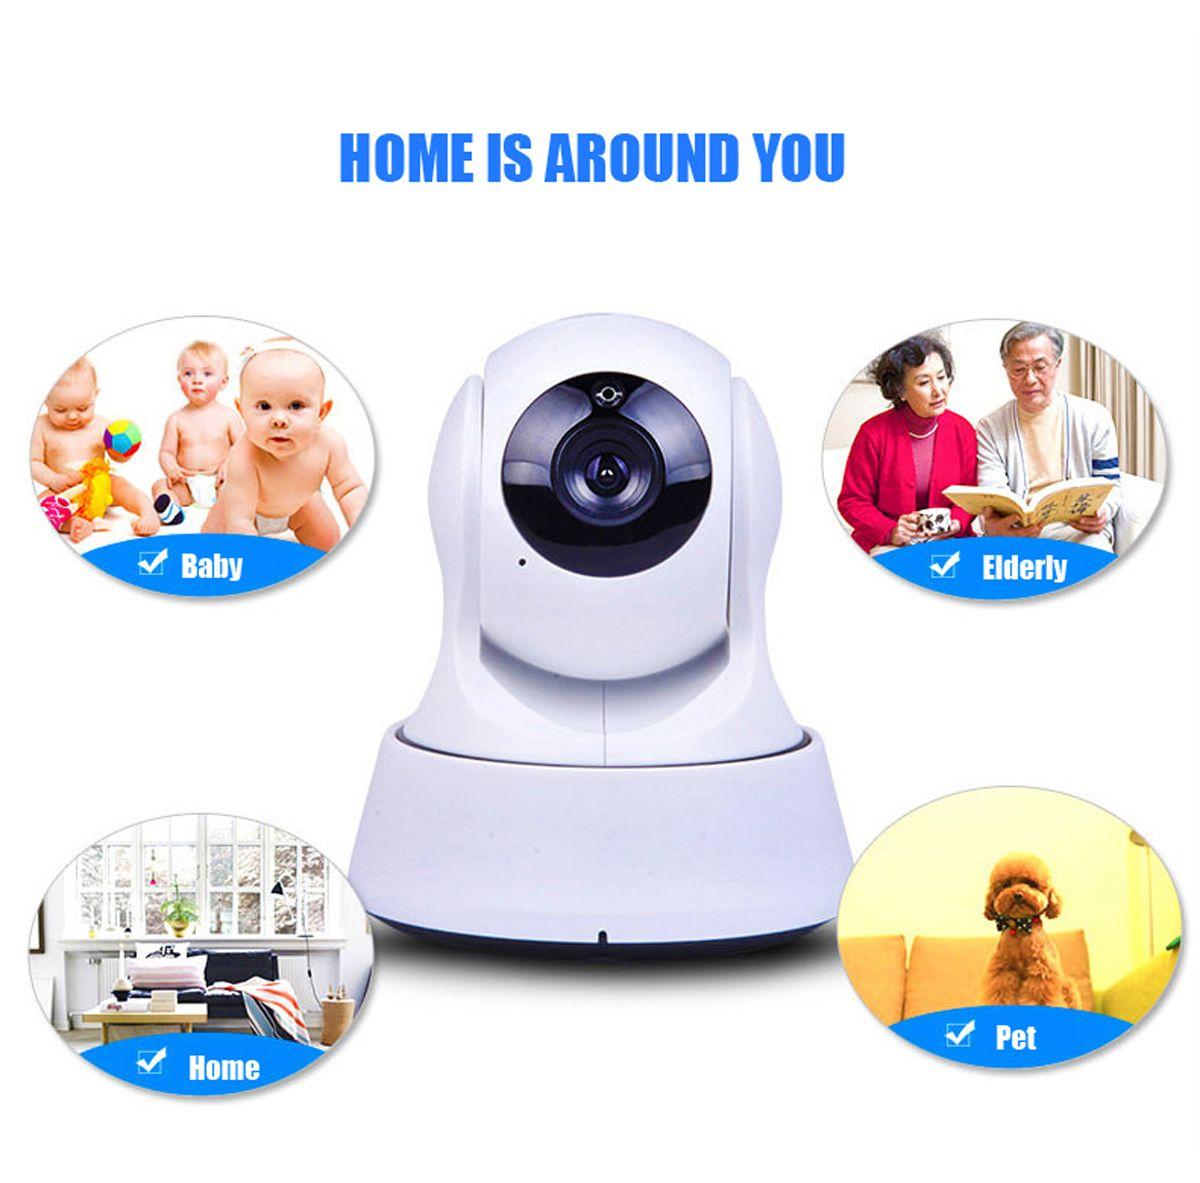 Wireless Camera LeFun Baby Monitor WiFi IP Surveillance Camera Nanny Cam  Video Recording Play Plug Pan Tilt Remote Motion Detect 1406006 Security  Cctv